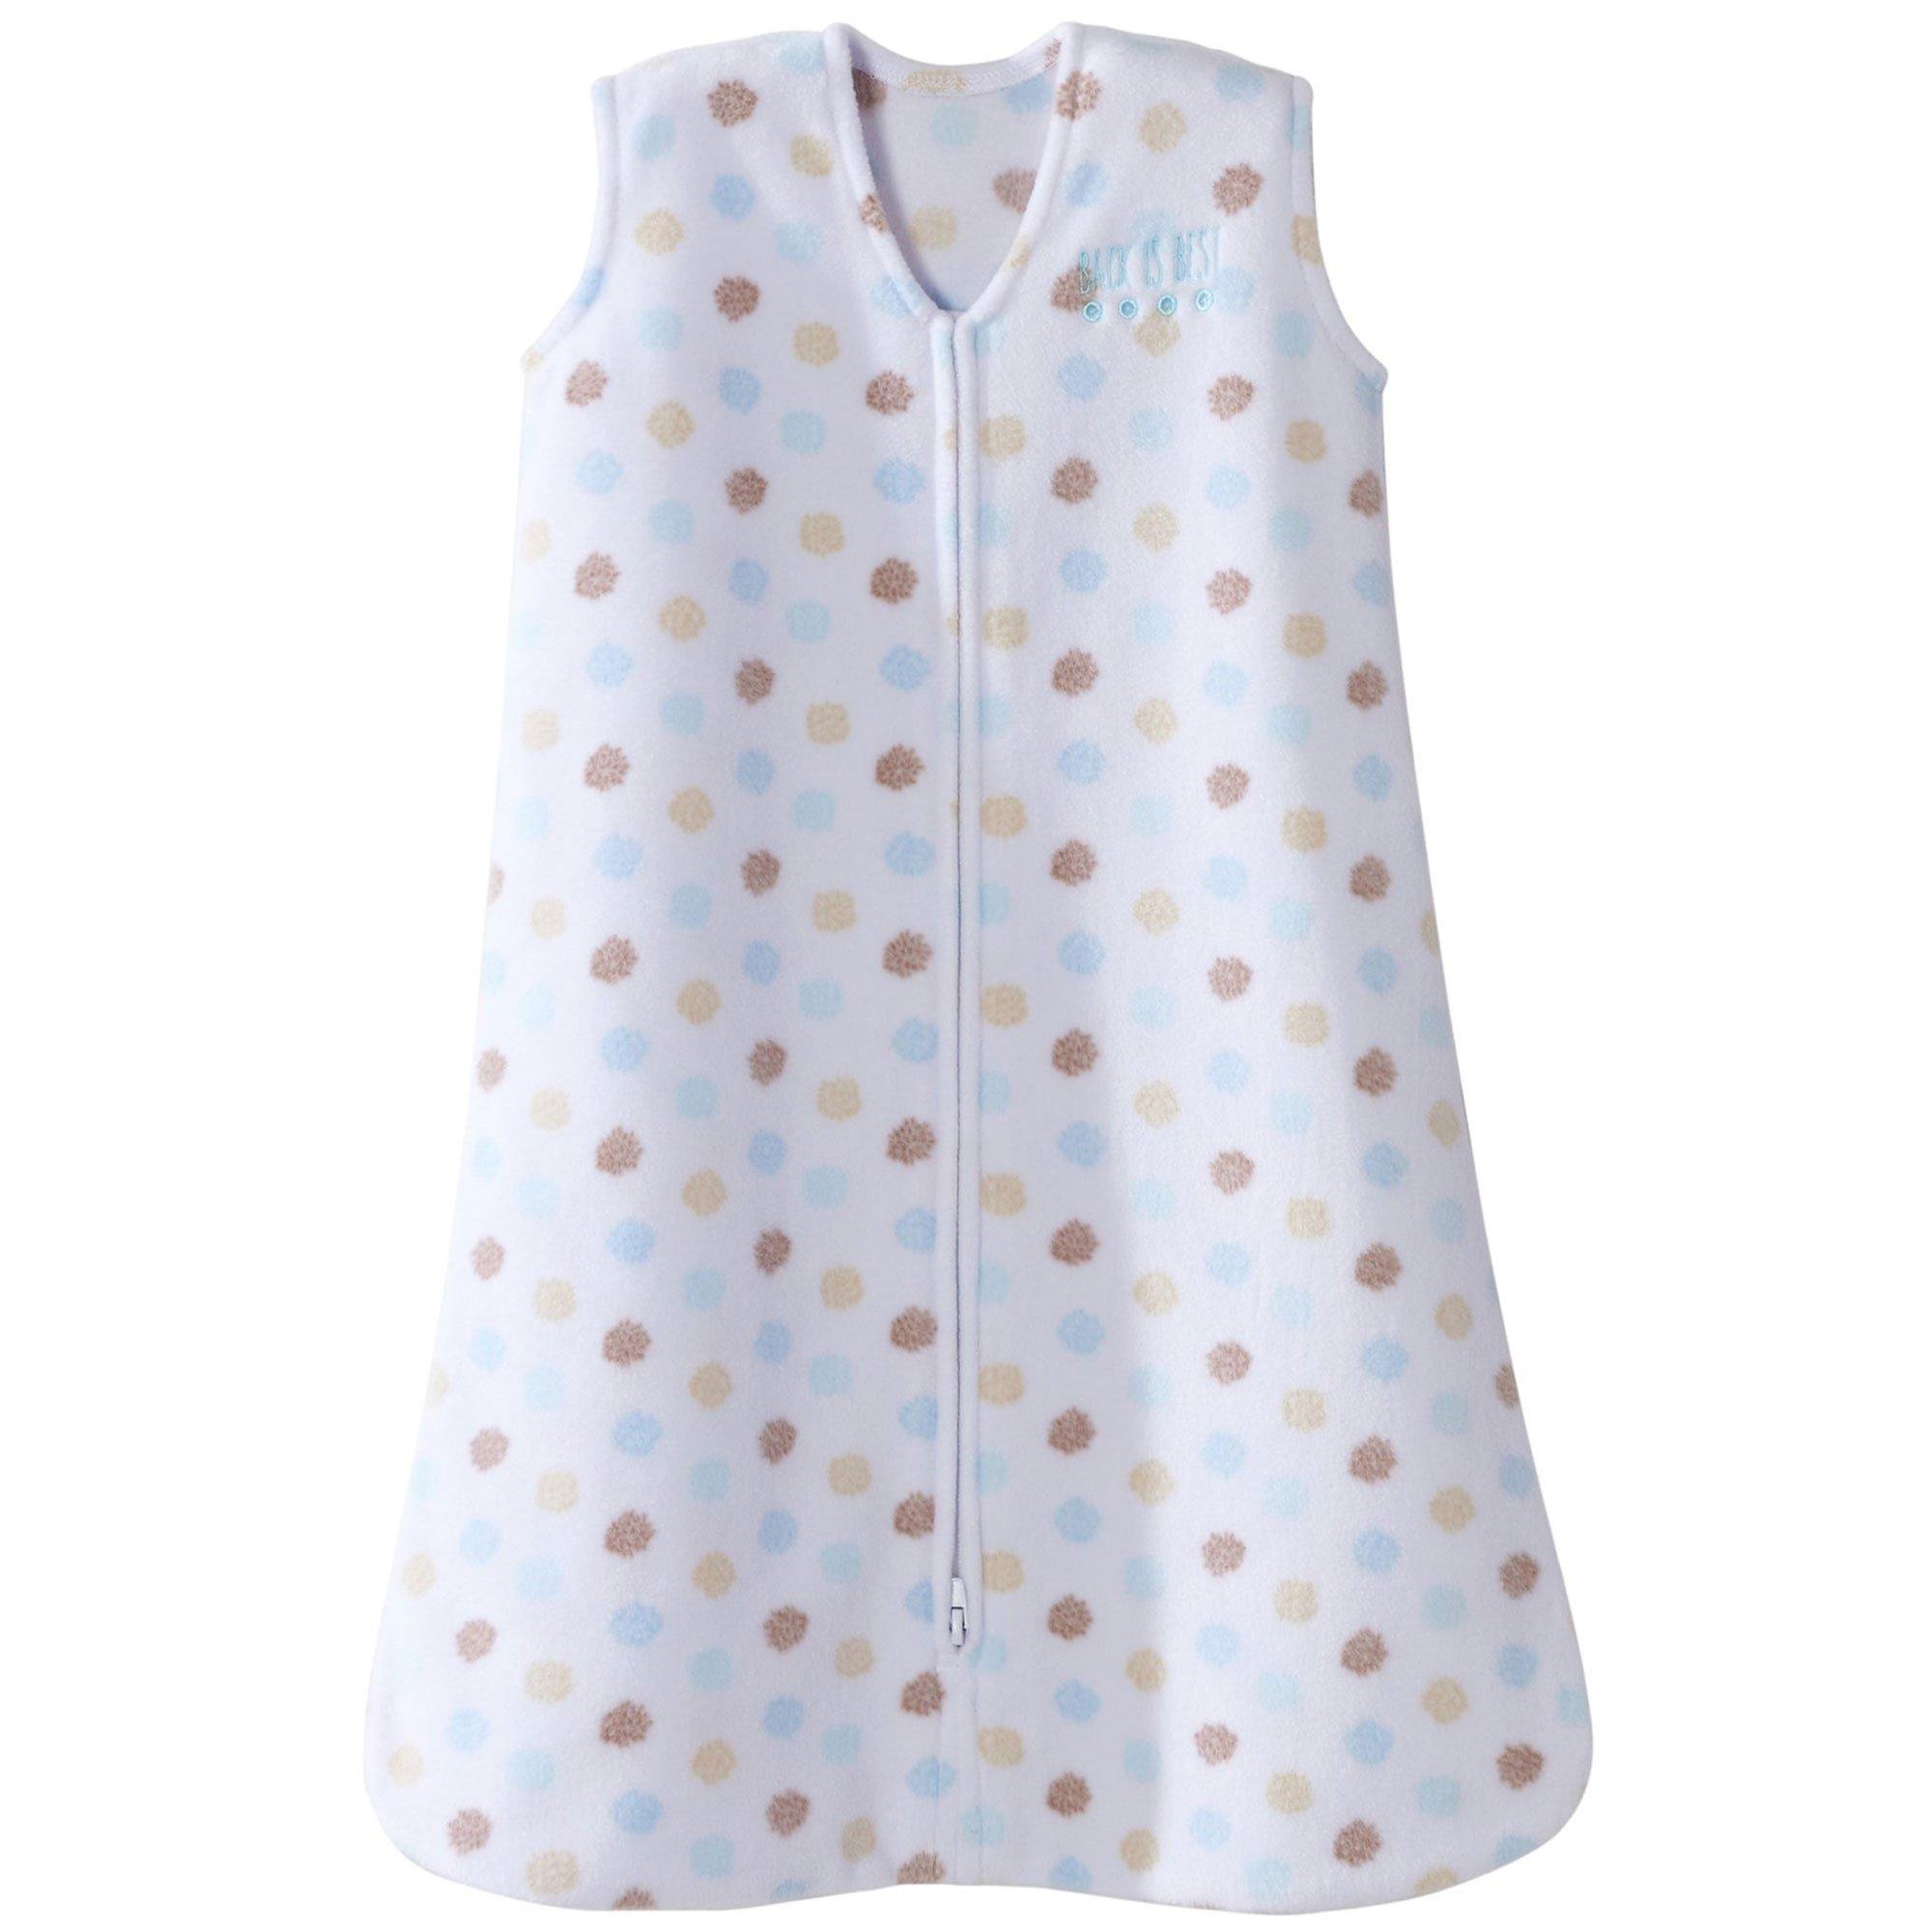 Halo Sleepsack Microfleece Wearable Baby Blanket, Starburst Sprinkle, Small